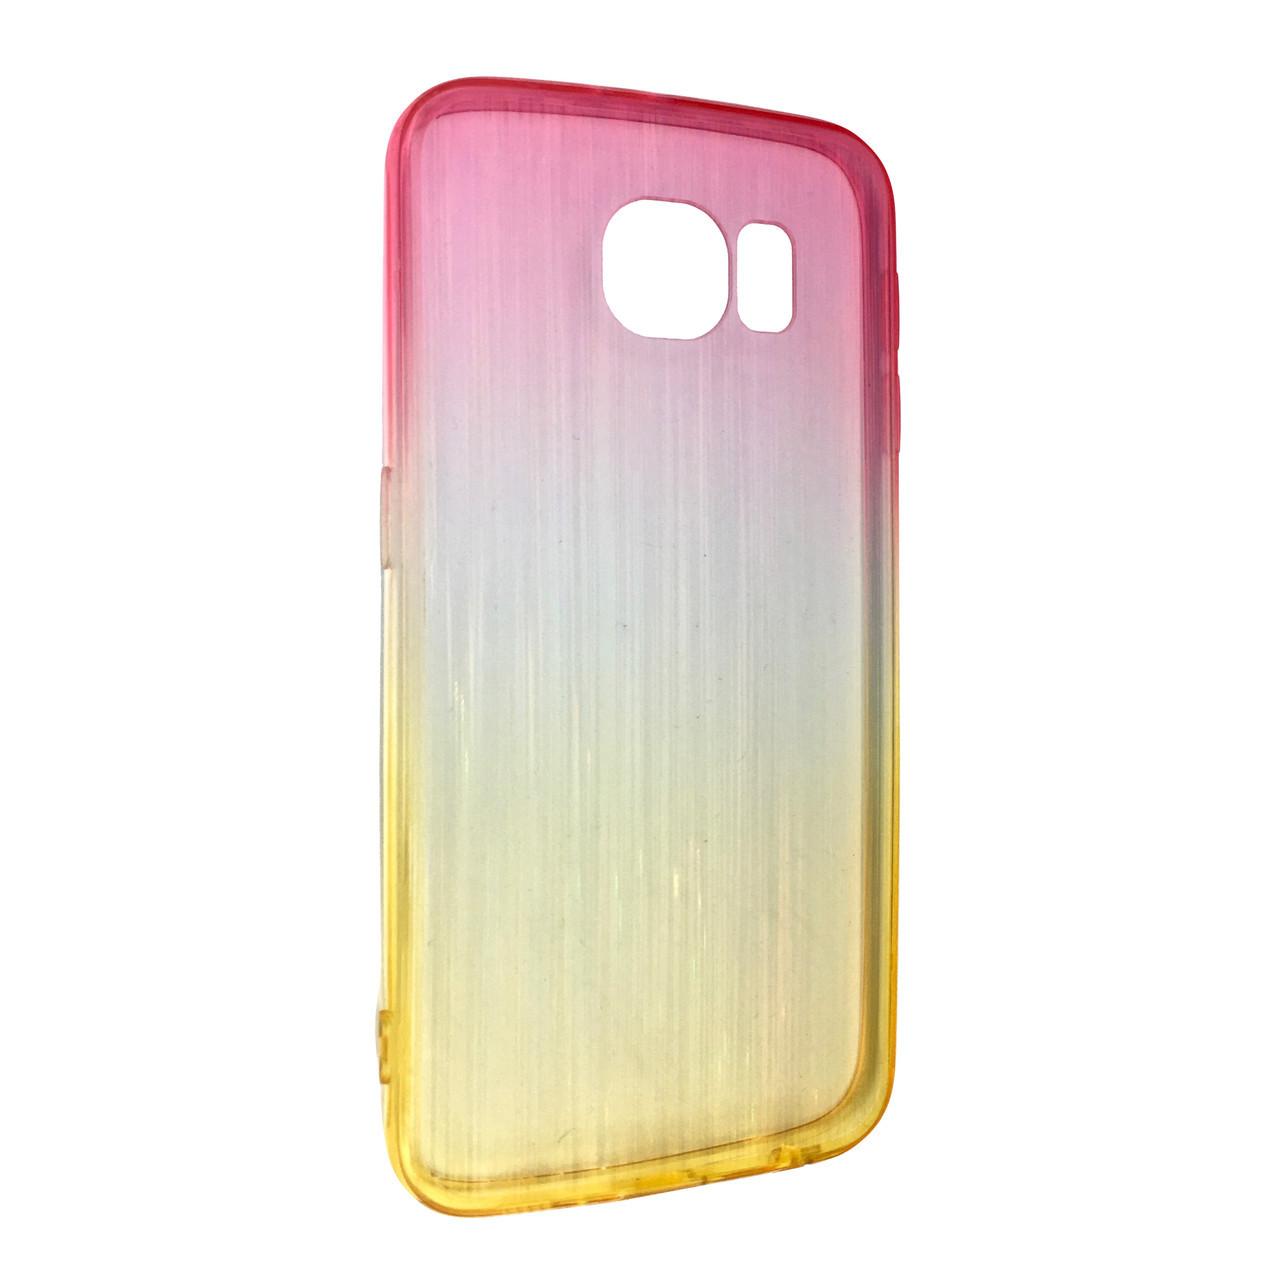 Чехол радуга градиент SAMSUNG S6 (yellow/pink)